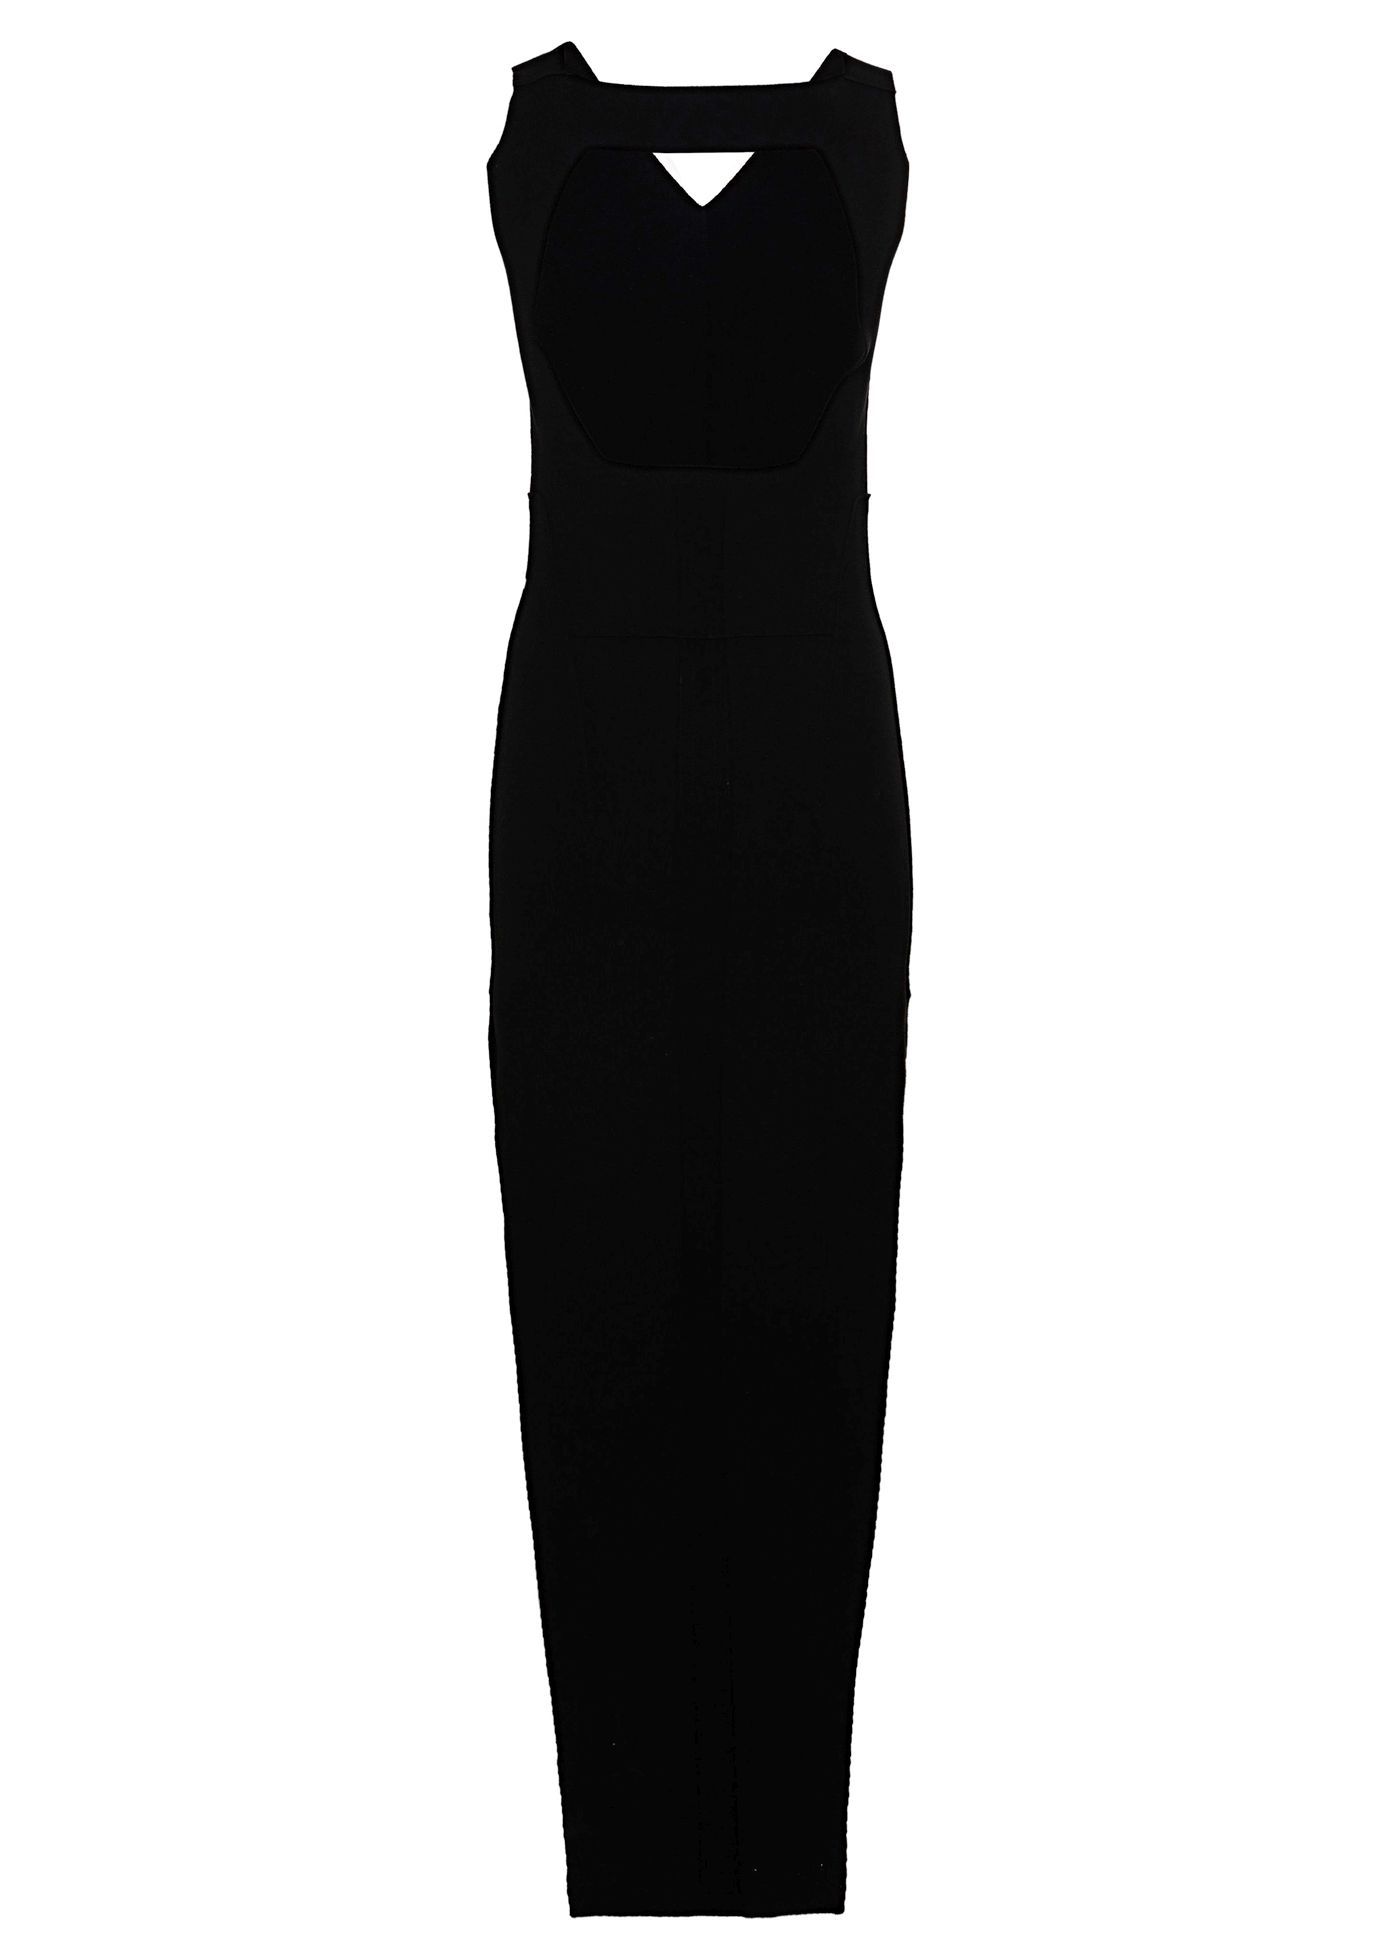 ABITO IN MAGLIA - V DRESS image number 1